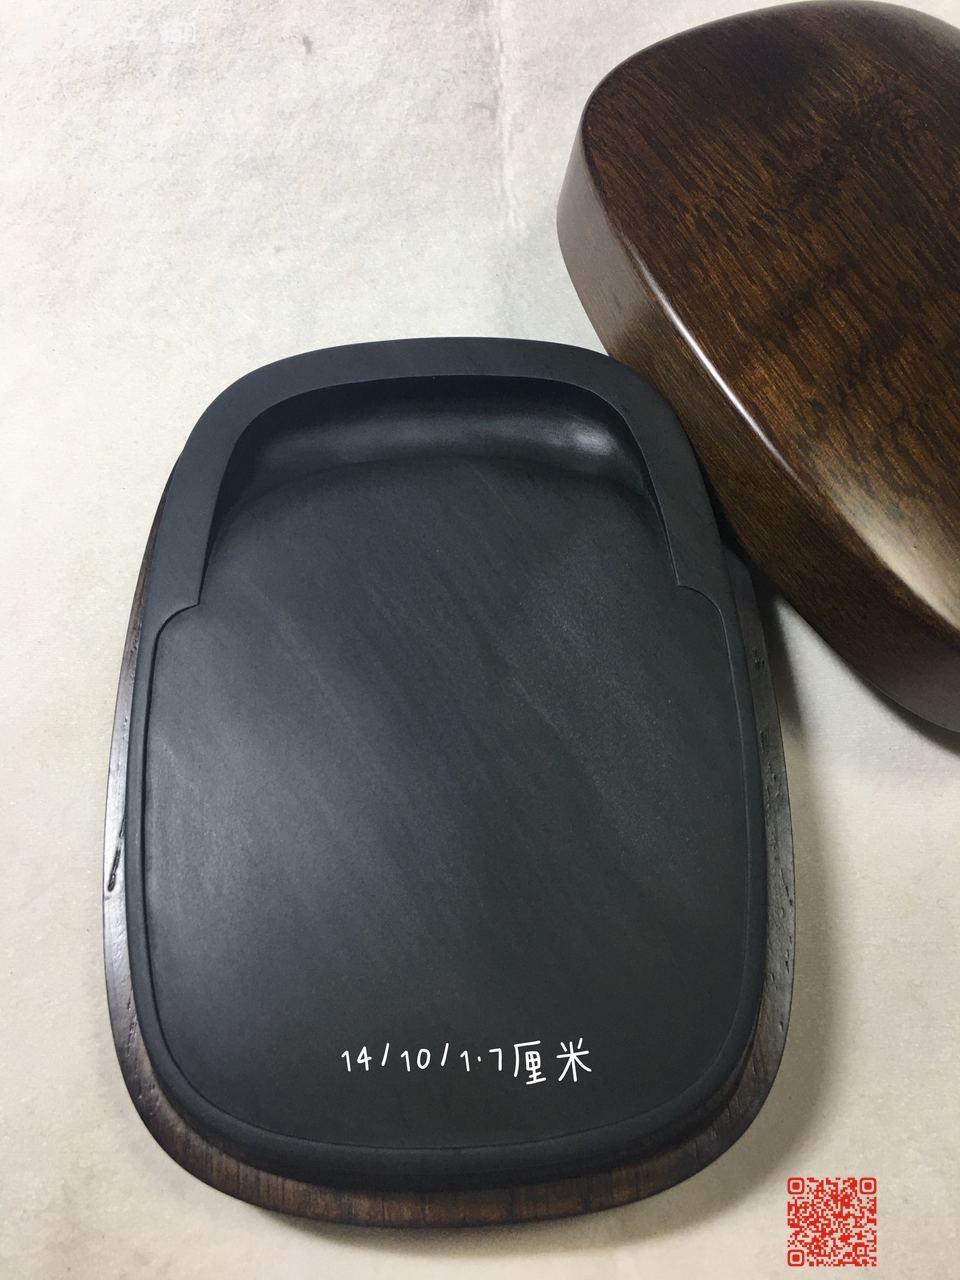 5B5A1793-3F66-4683-BDBE-1FBB9E15280C.jpeg